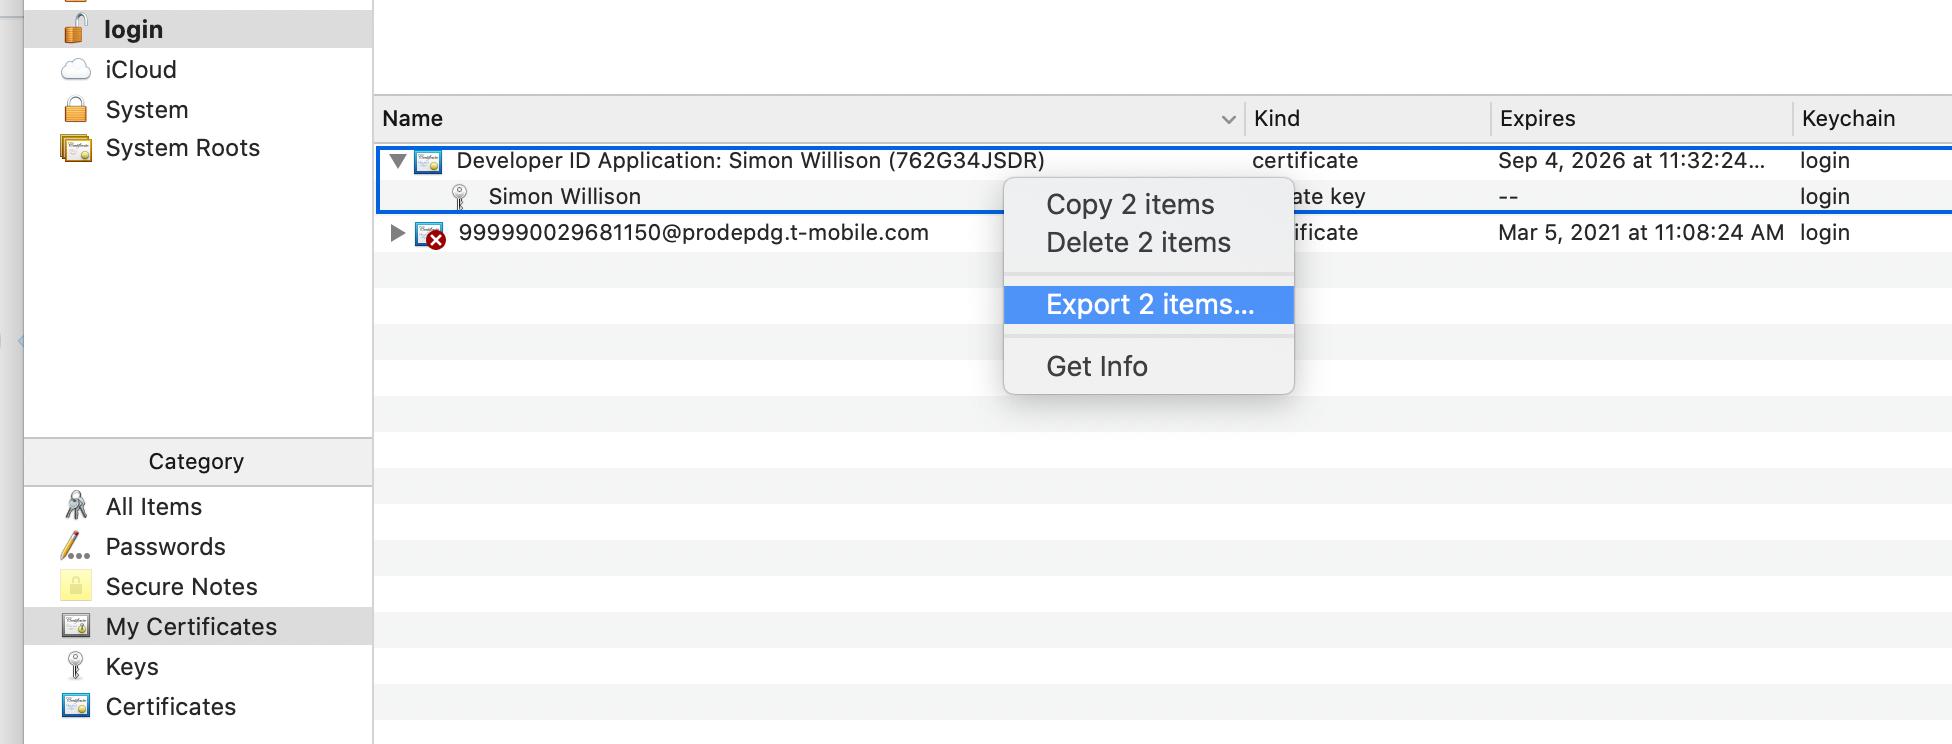 Screenshot of the Keynote export interface